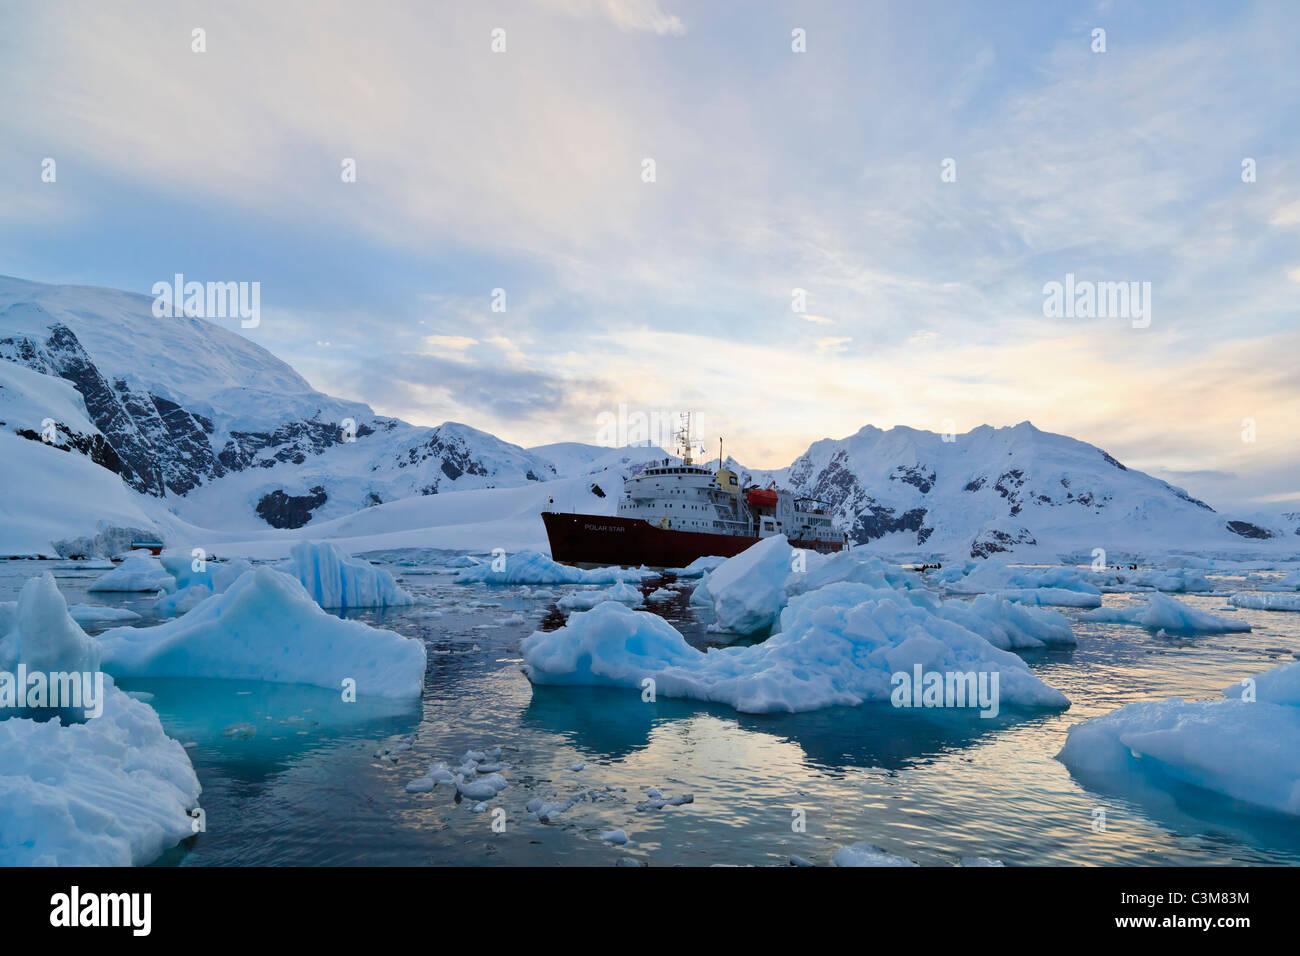 South Atlantic Ocean, Antarctica, Antarctic Peninsula, Gerlache Strait, Paradise Bay, Polar star icebreaker cruise - Stock Image